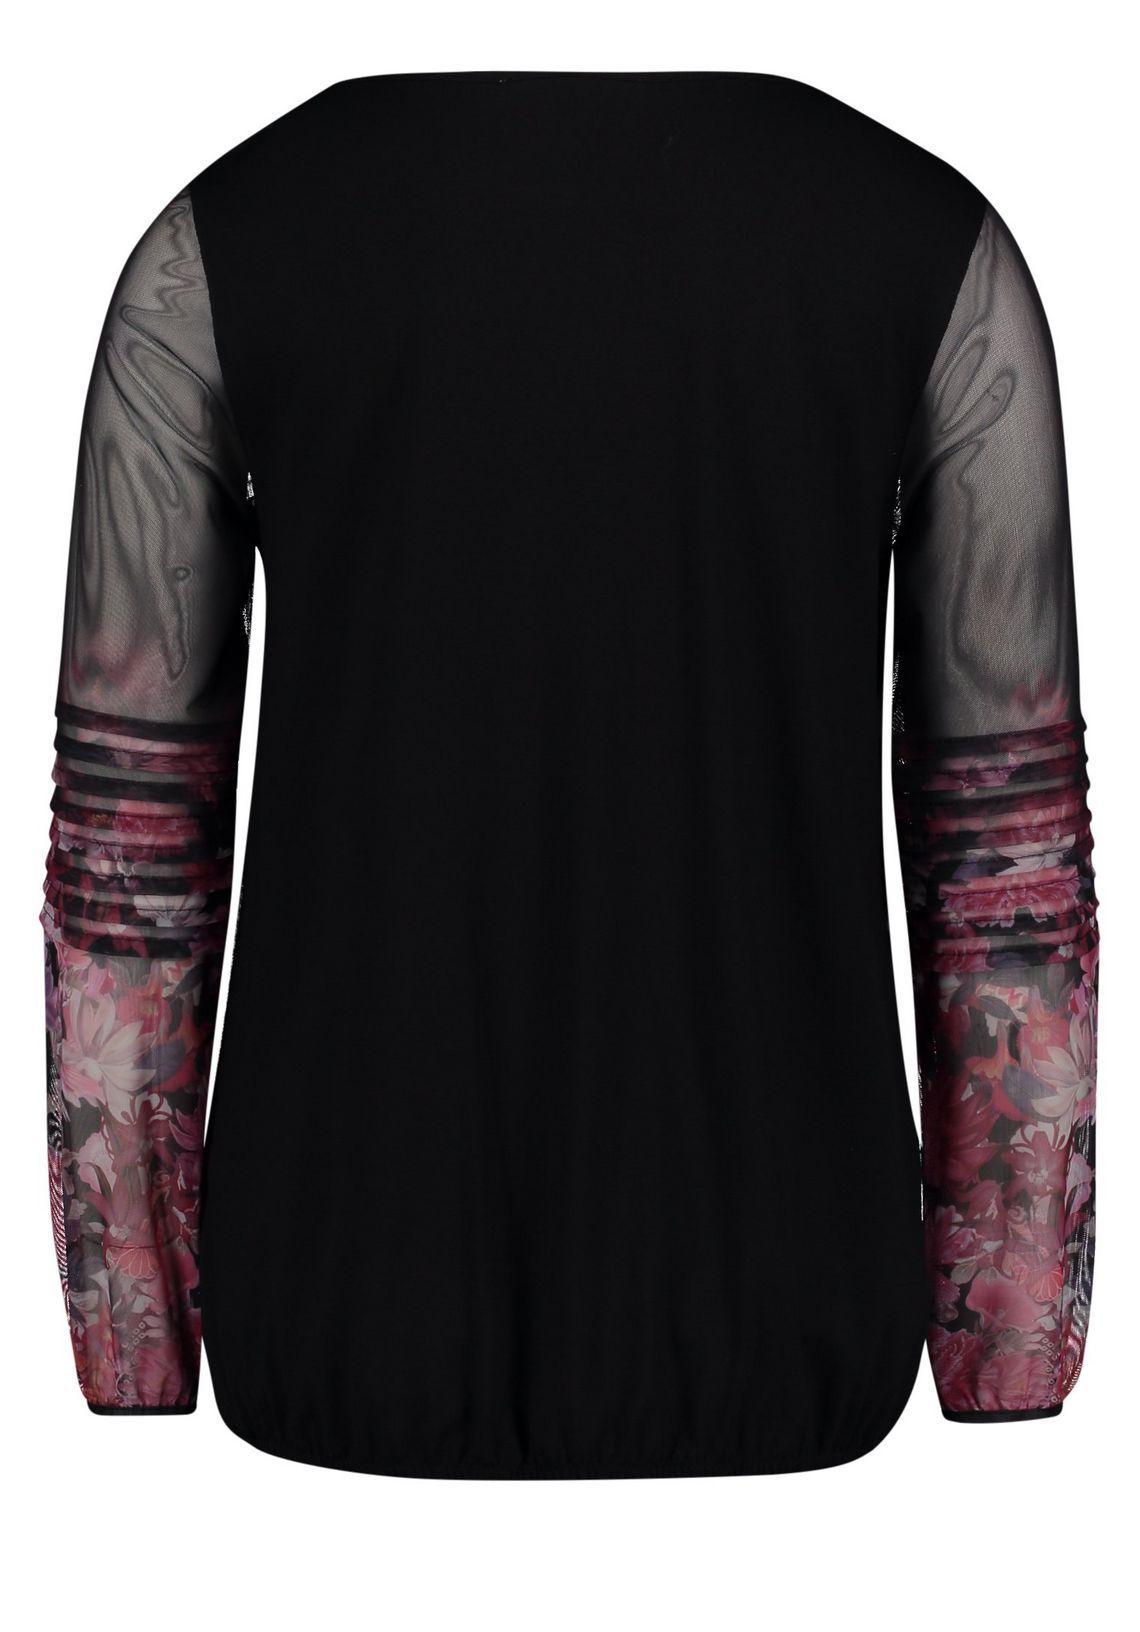 Betty&co Patchwork Shirt Met Lange Mouwen Nu Online Bestellen Zwart/donker Roze - Grijs SYbtAJkT